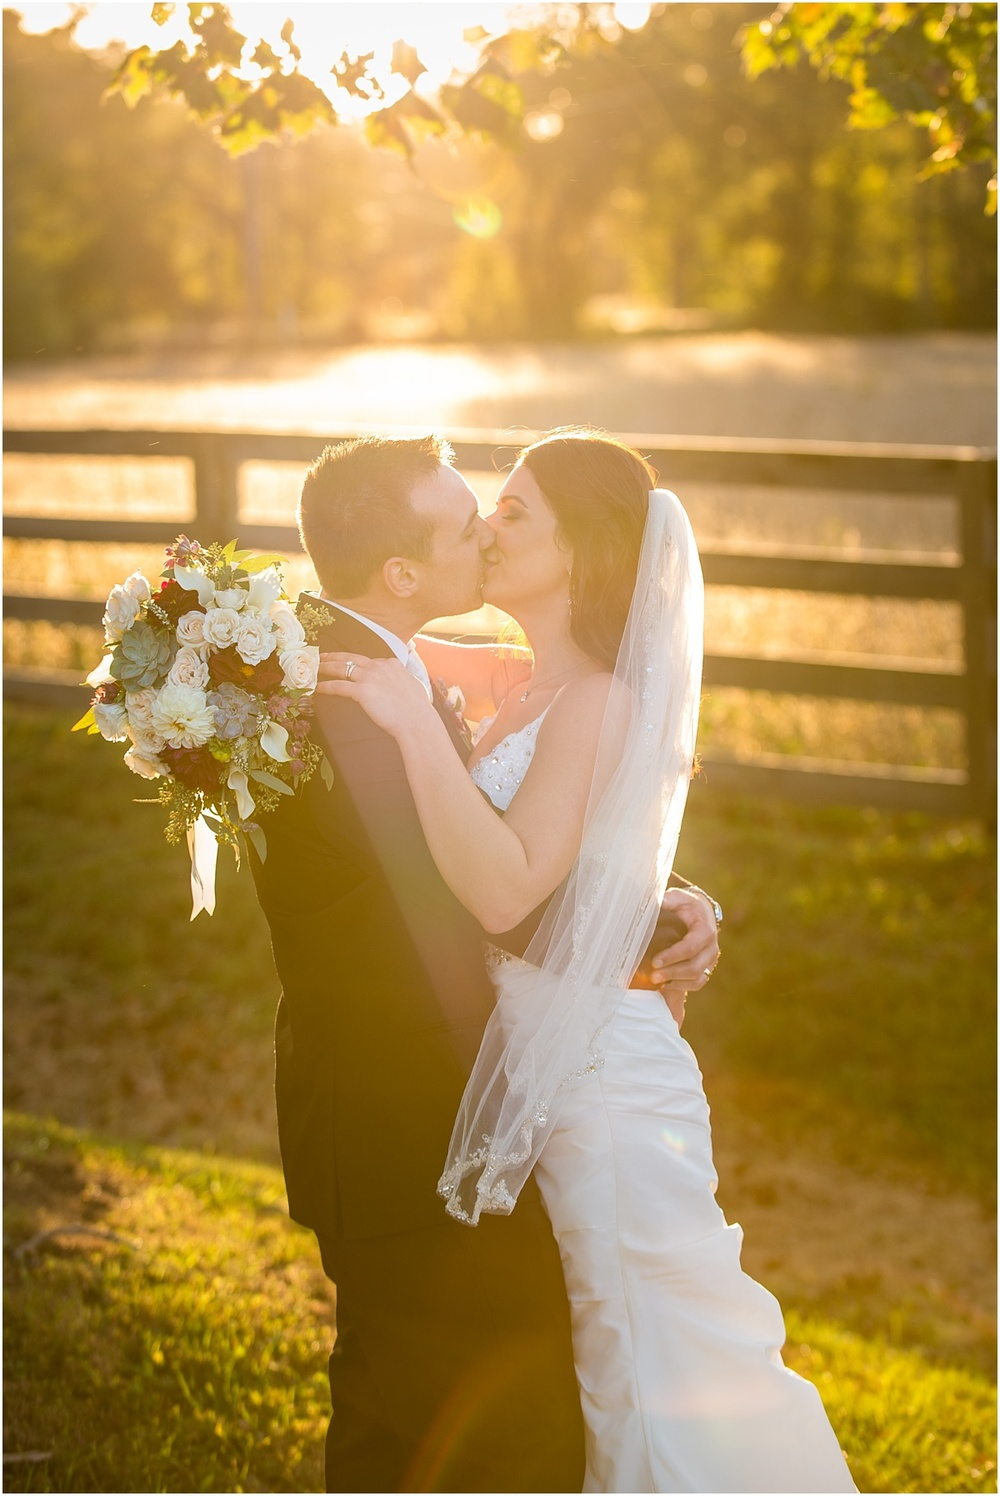 Greg Smit Photography Nashville wedding photographer Mint Springs Farm_0087